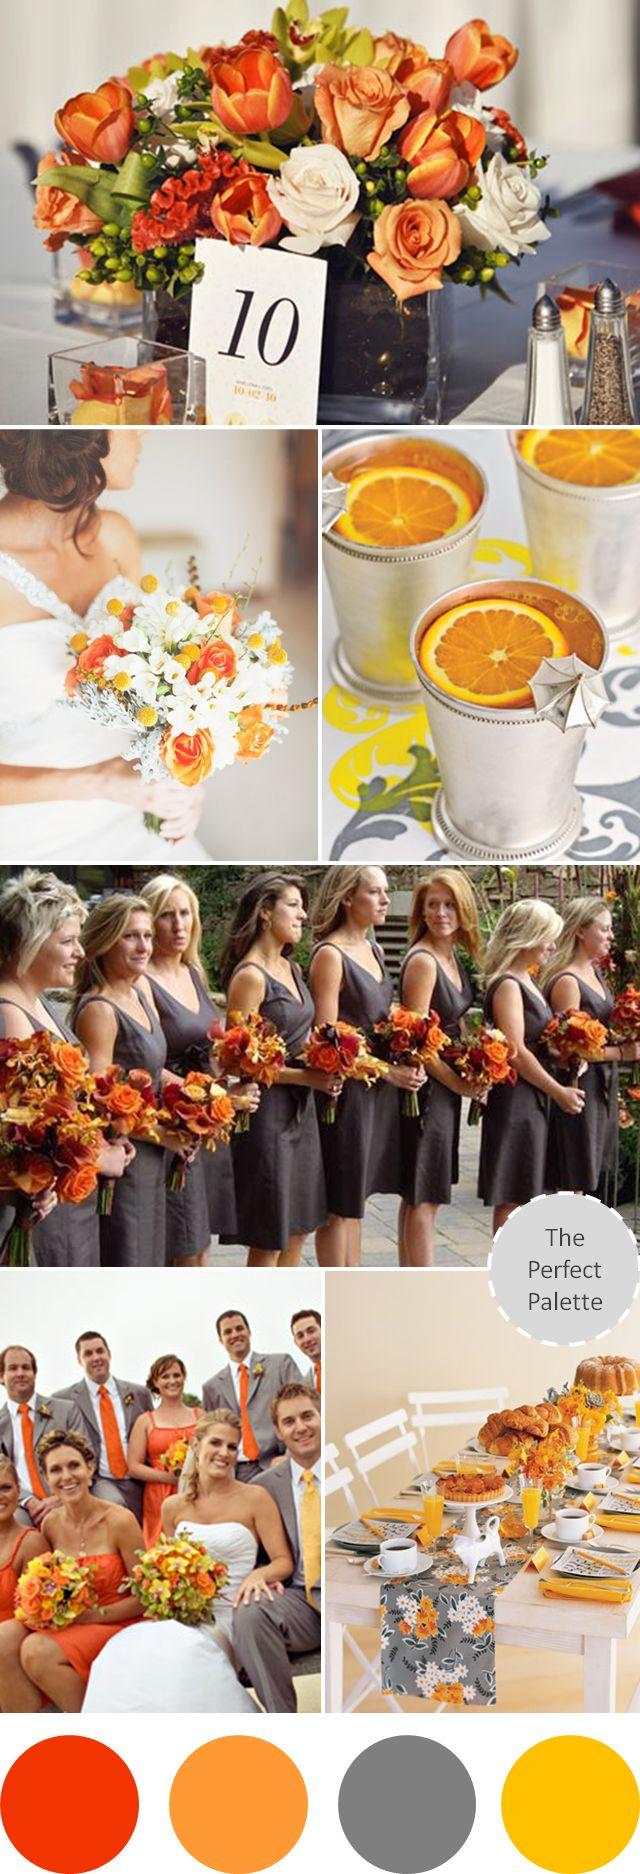 Wedding Colors I Love | Shades of Orange, Gray   Yellow!